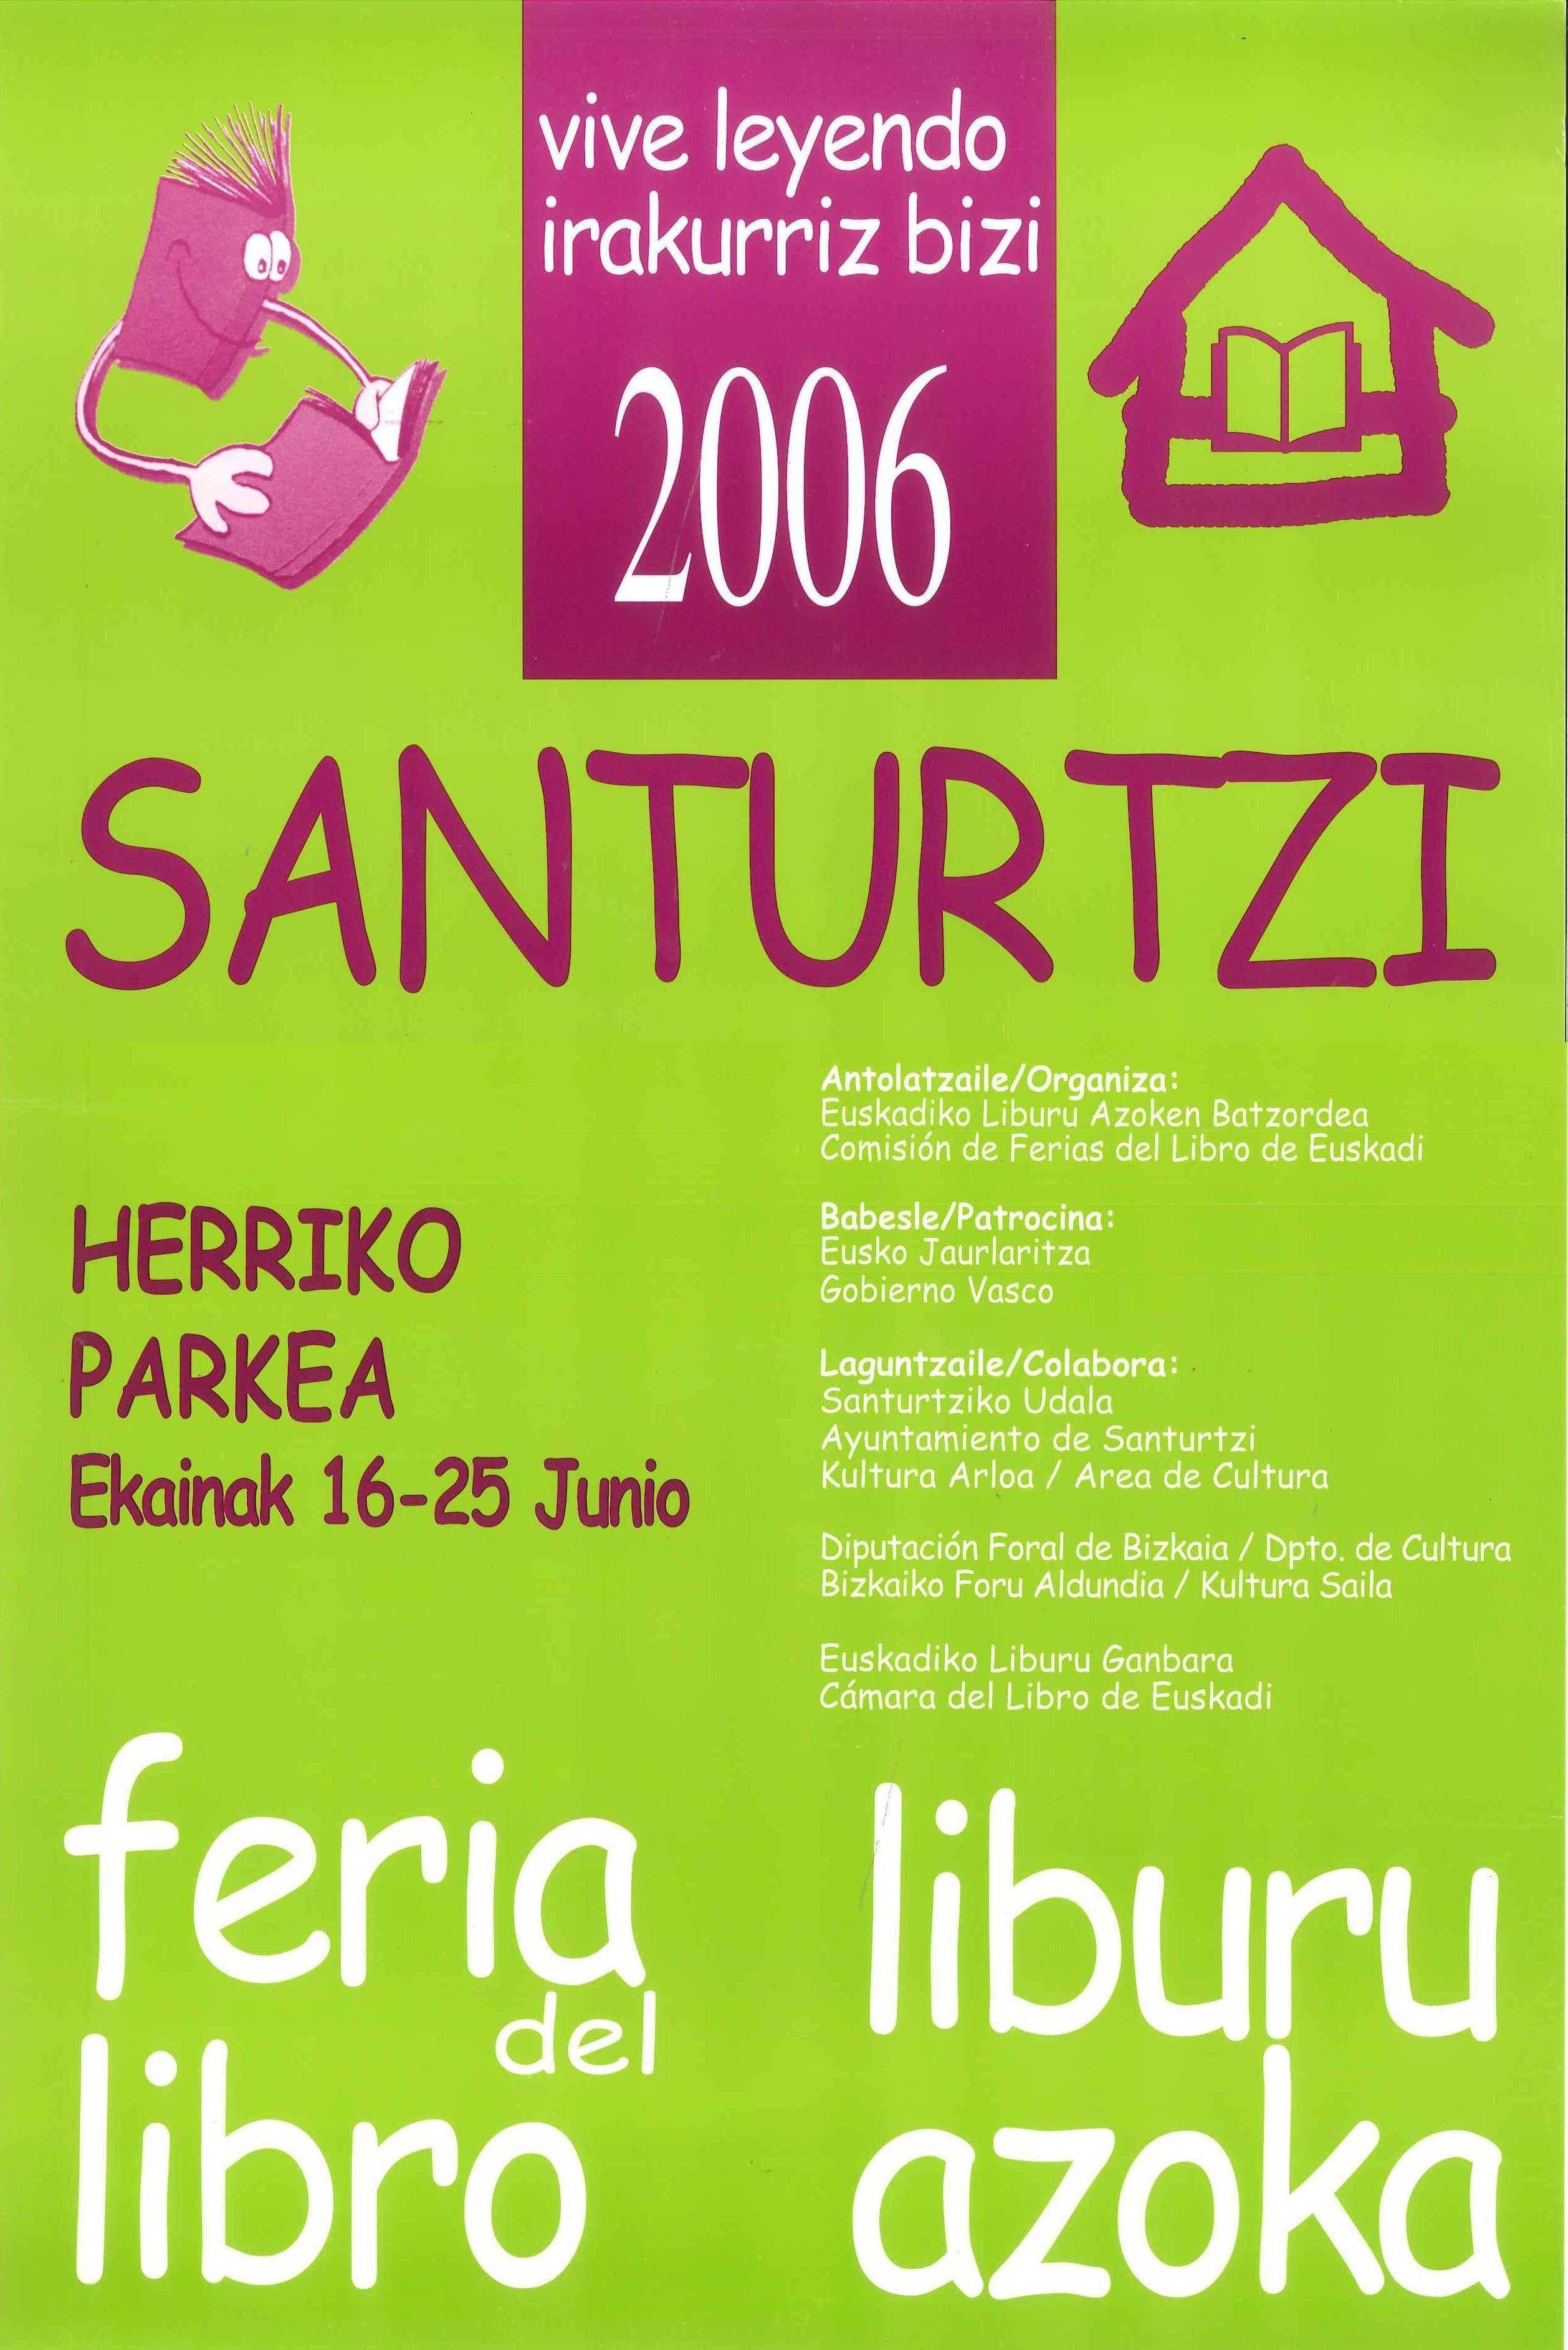 2006 cartel feria libro